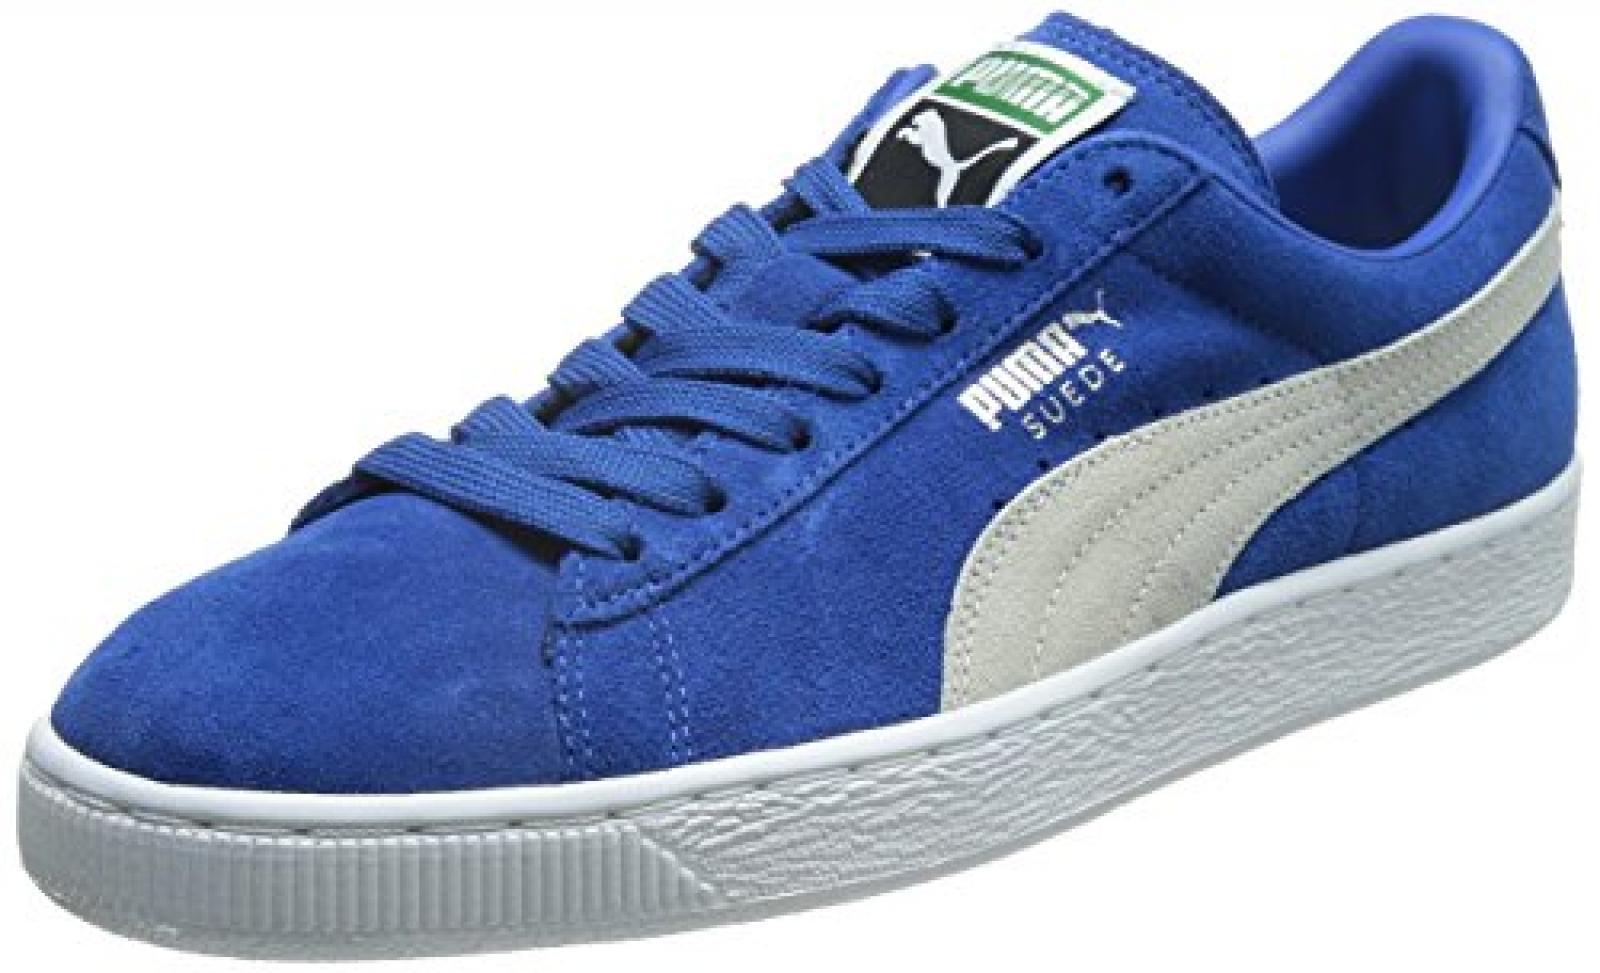 Puma Suede Classic+ Unisex-Erwachsene Sneakers